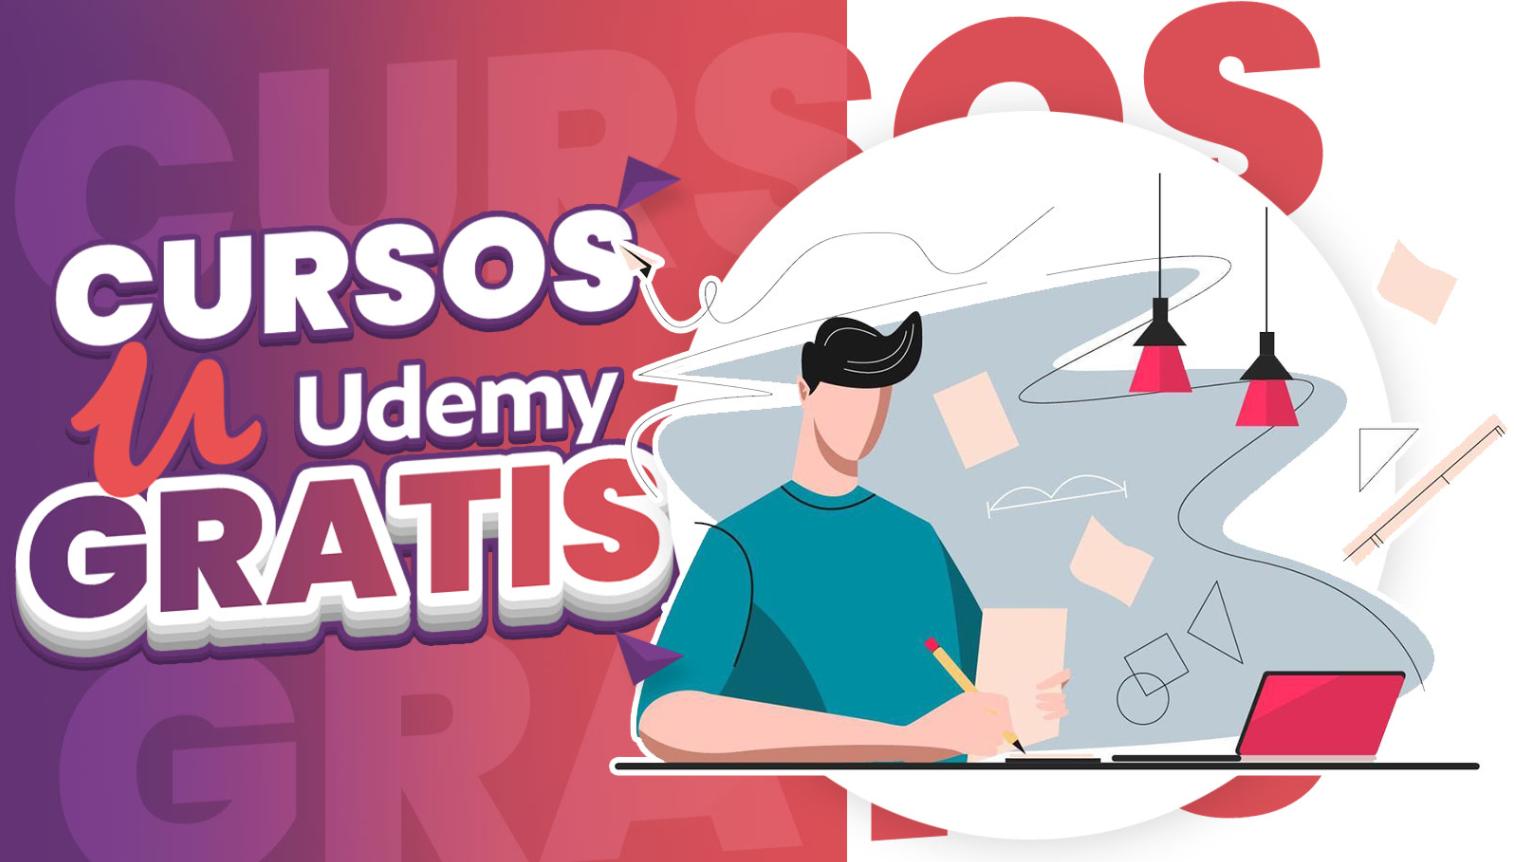 Cursos GRATIS de Photoshop, Python, Excel, SQL...